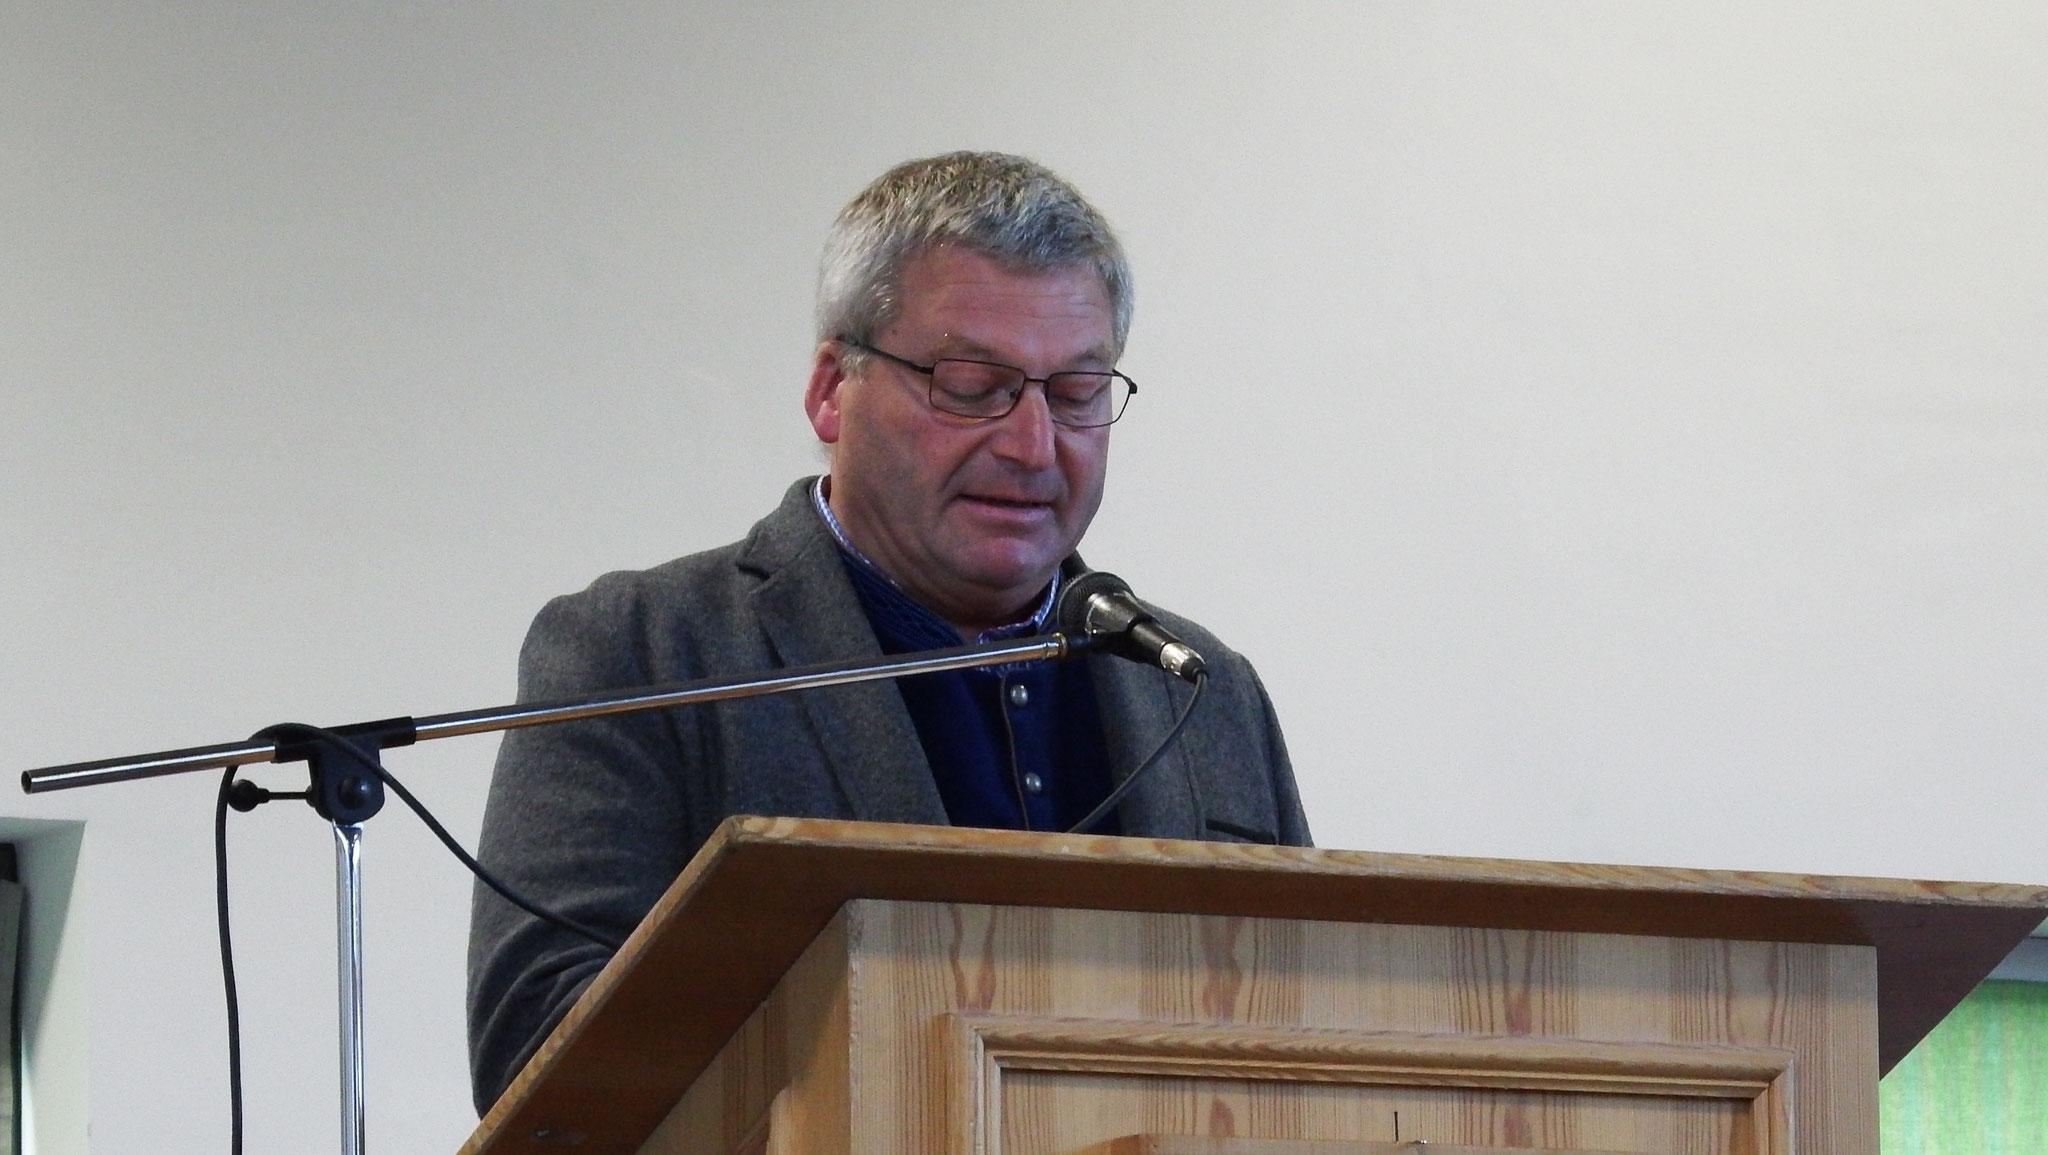 Bürgermeister Georg Menninger